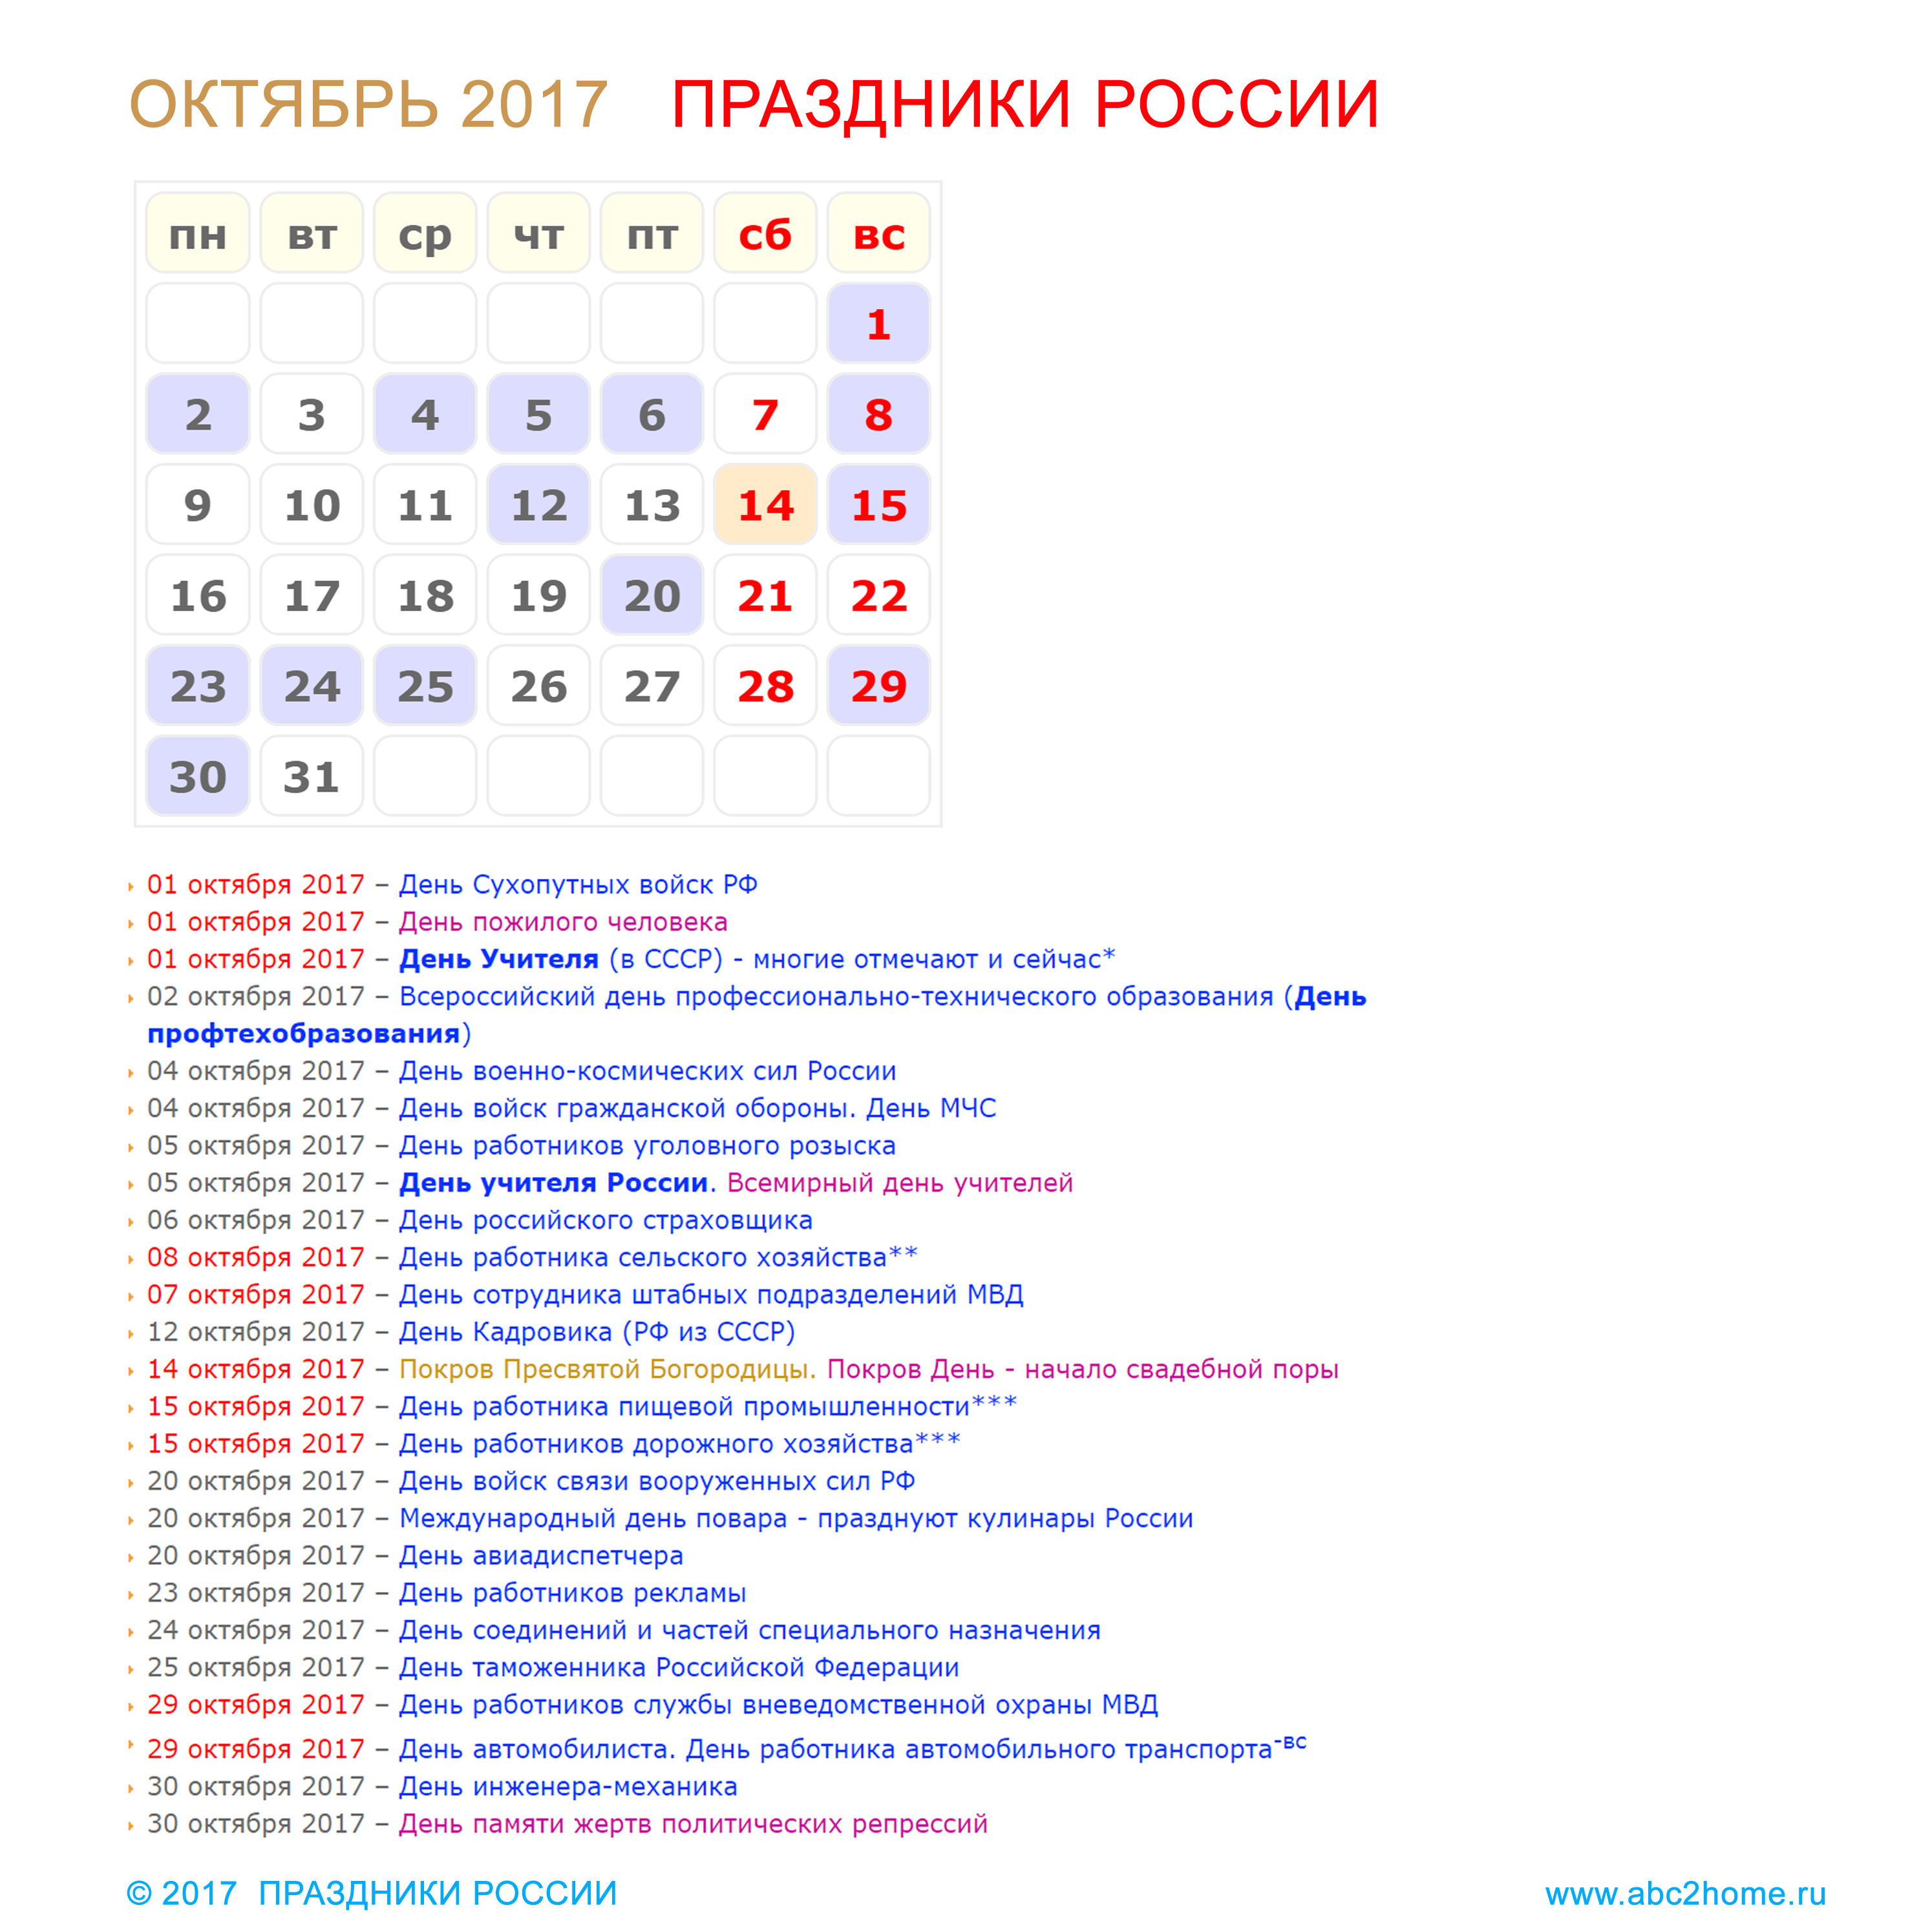 prazdniki_rossii_oktyabr_20.jpg